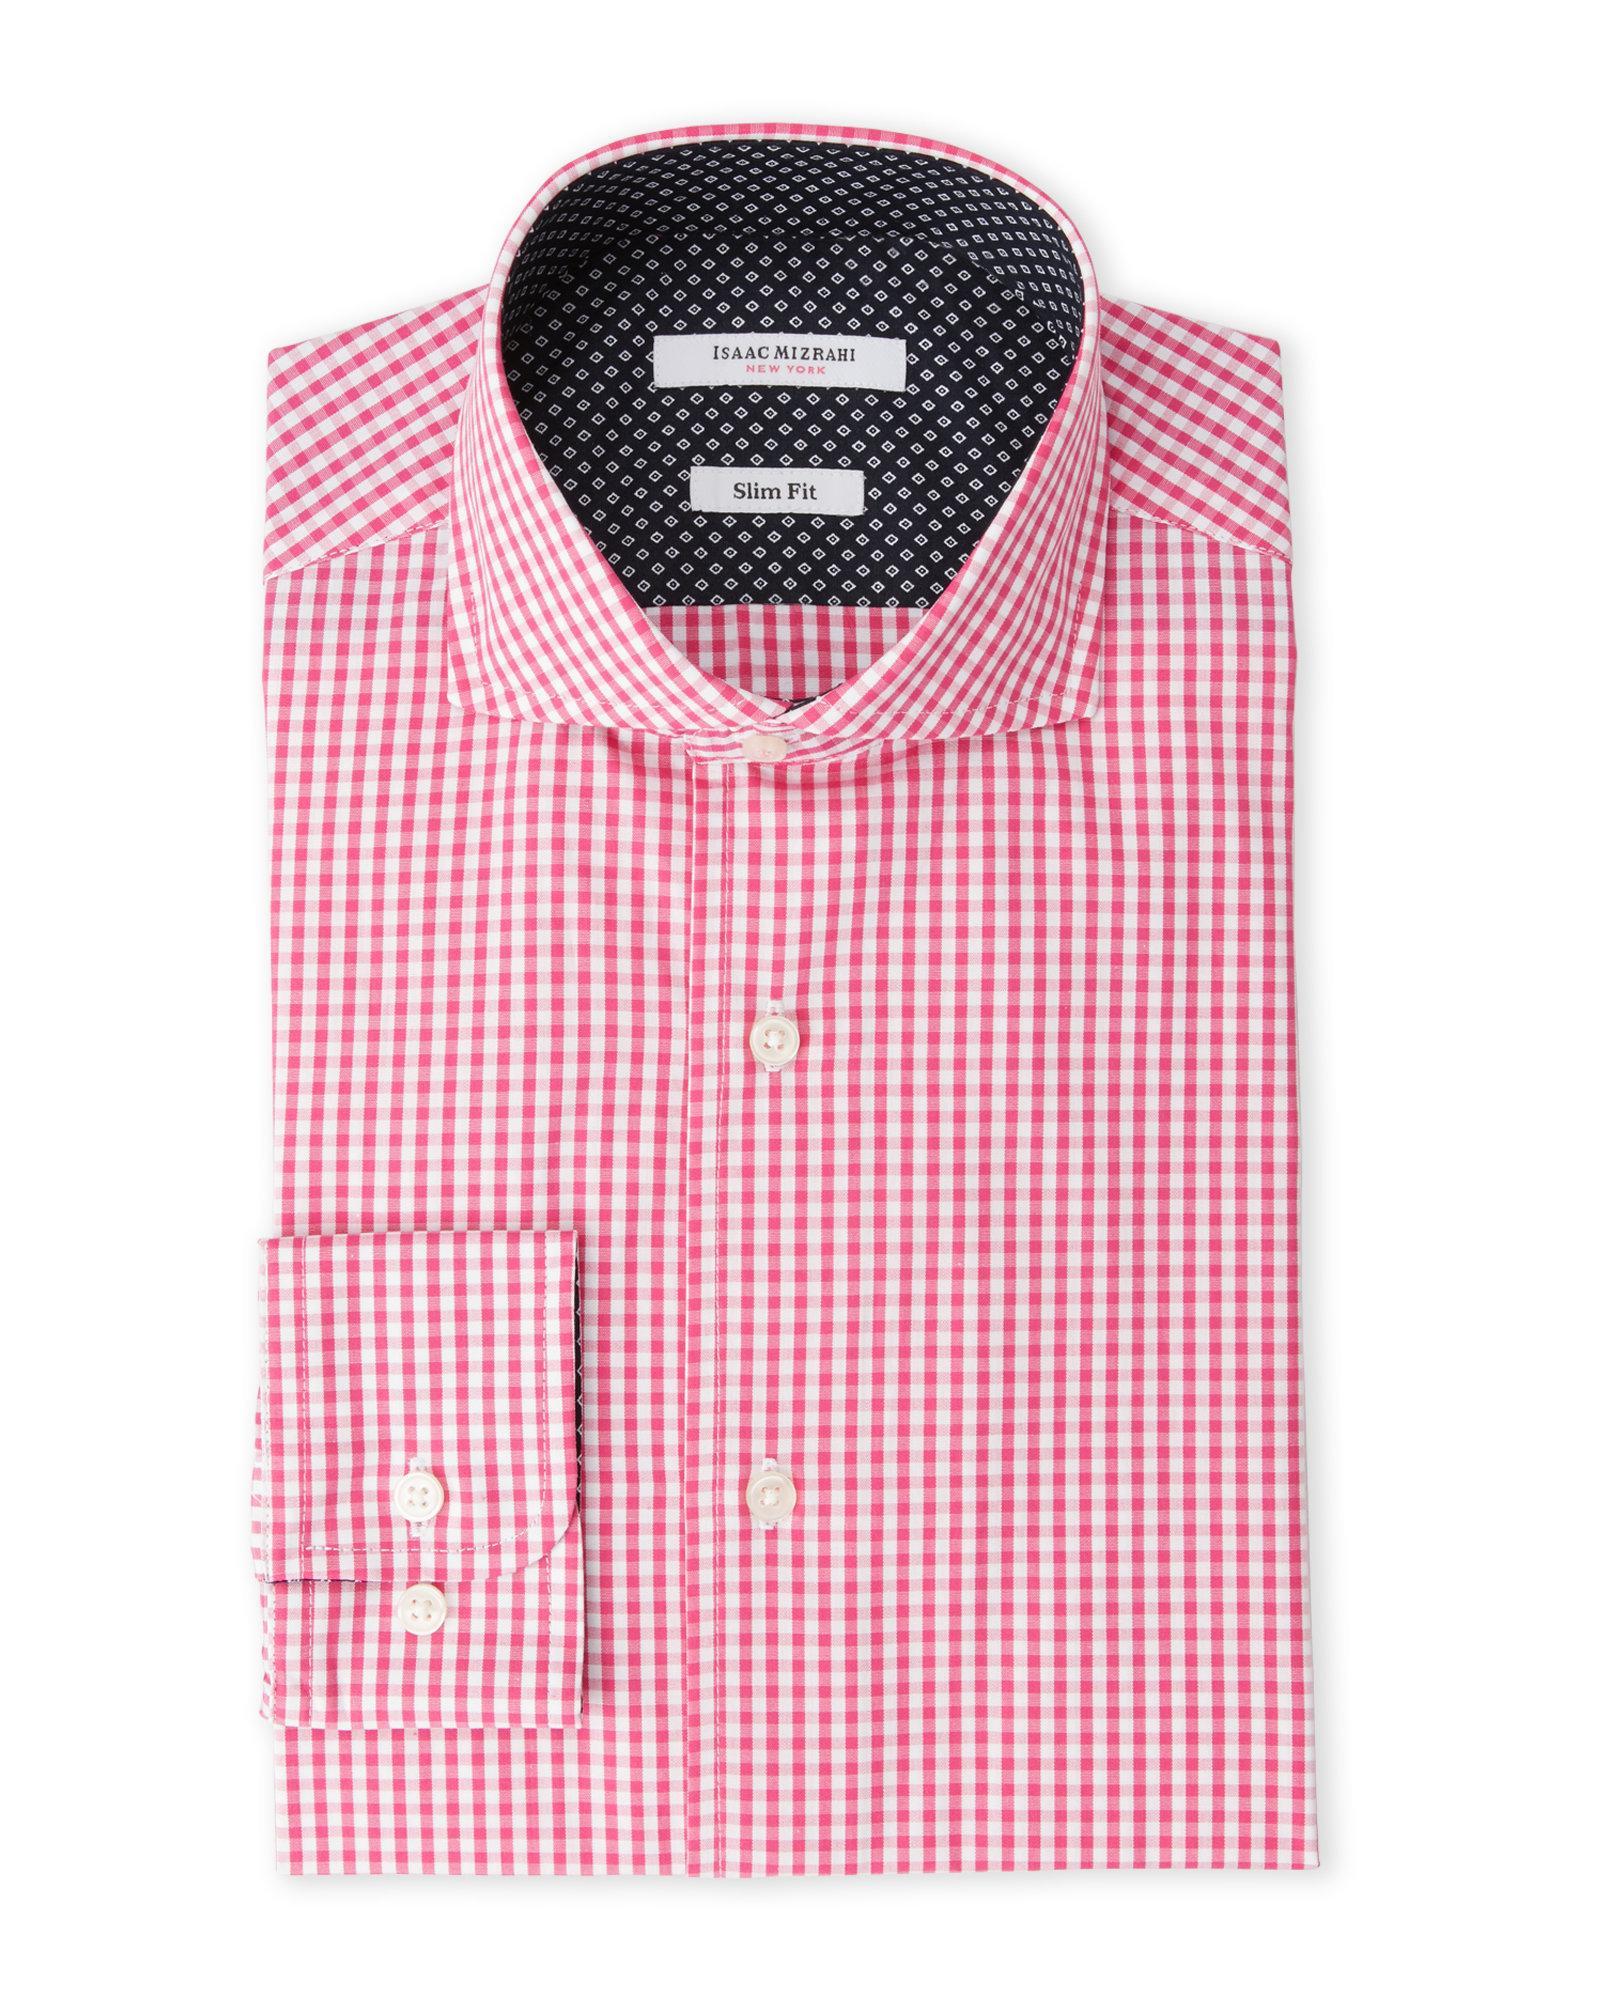 Isaac mizrahi new york cherry gingham slim fit dress shirt for Century 21 dress shirts